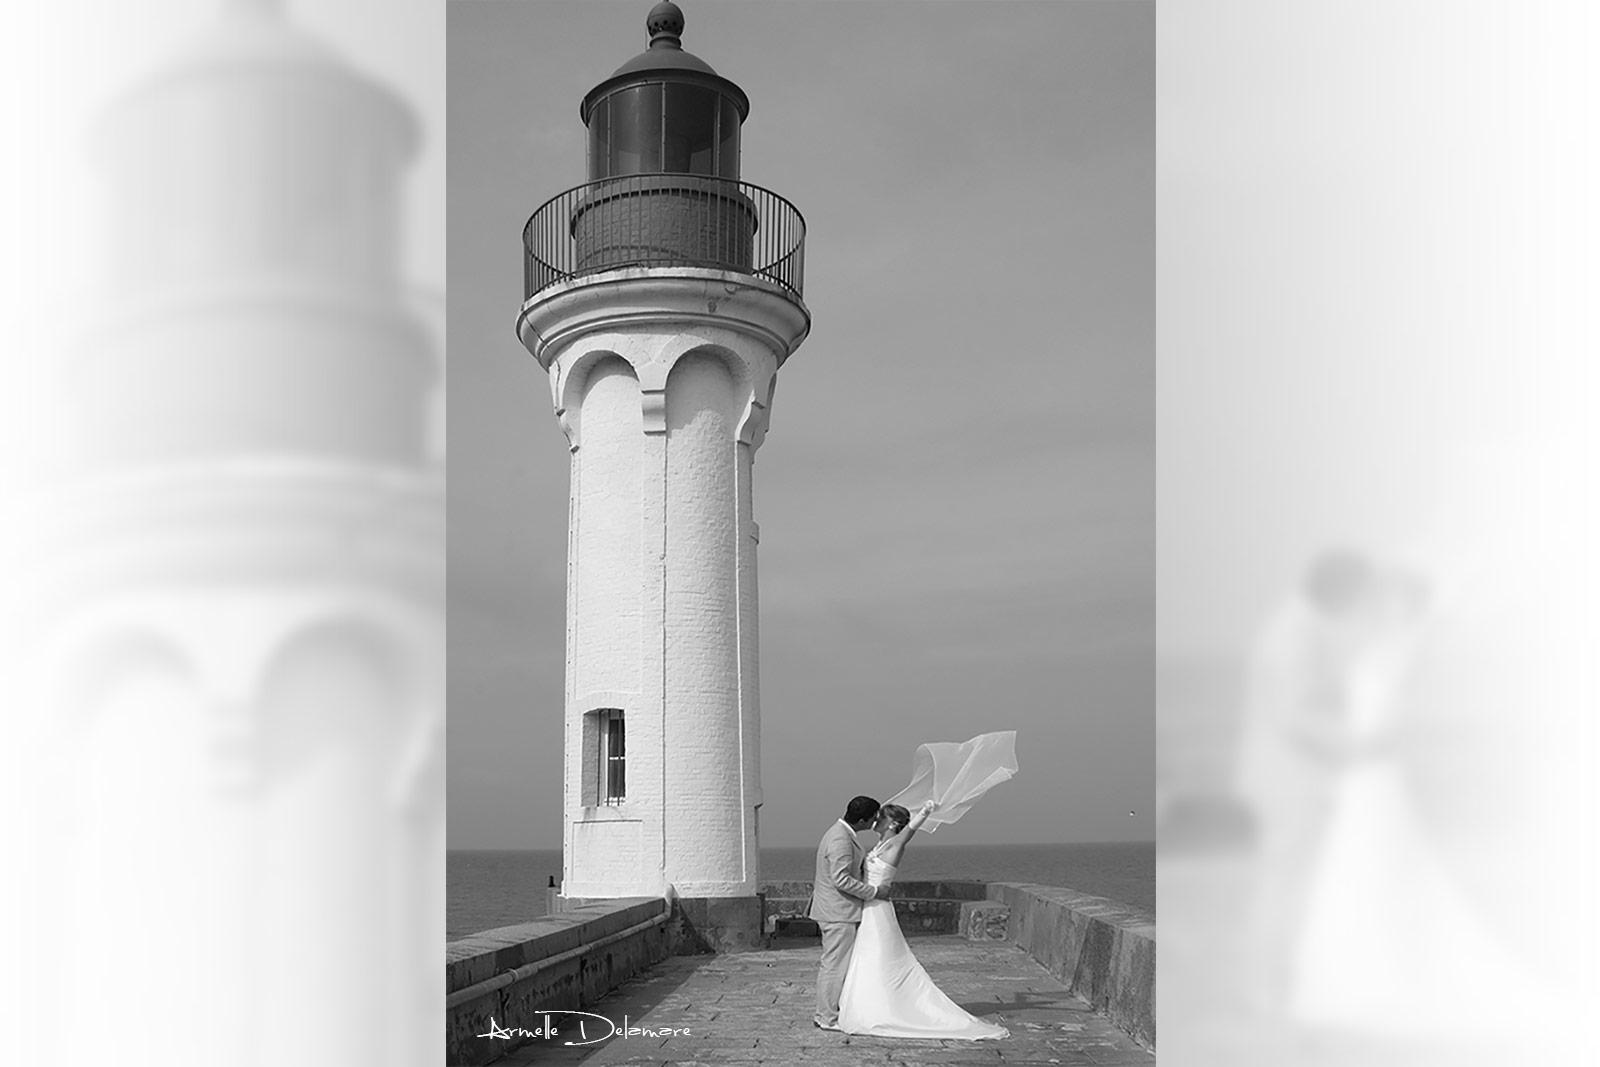 Armelle Delamare Photographe Pavilly Photographie mariage reportages portraits